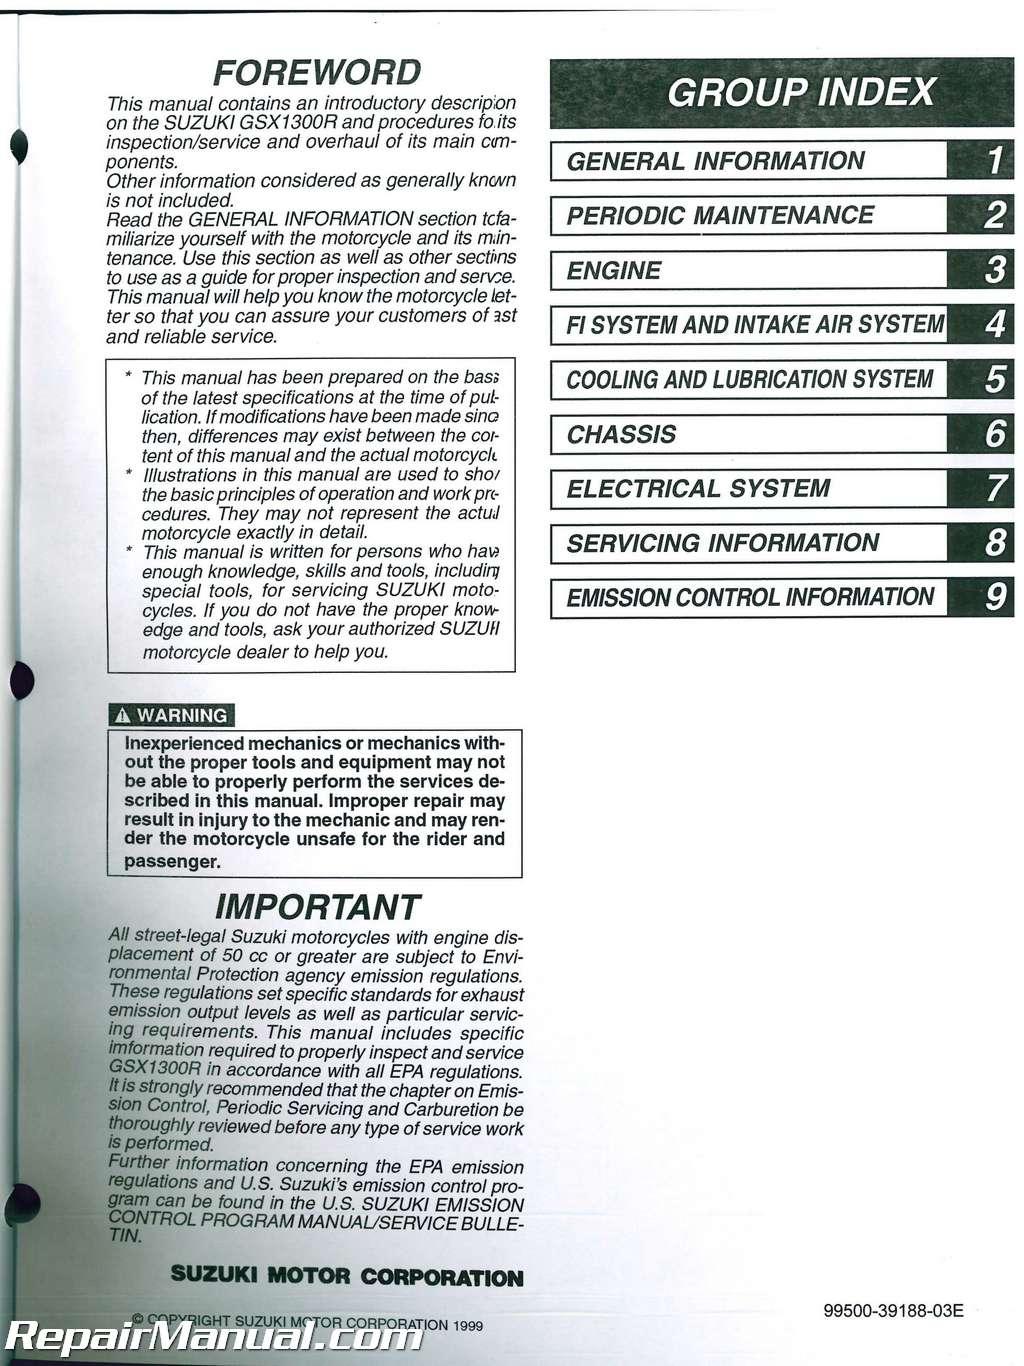 hayabusa service manual rh hayabusa service manual tempower us